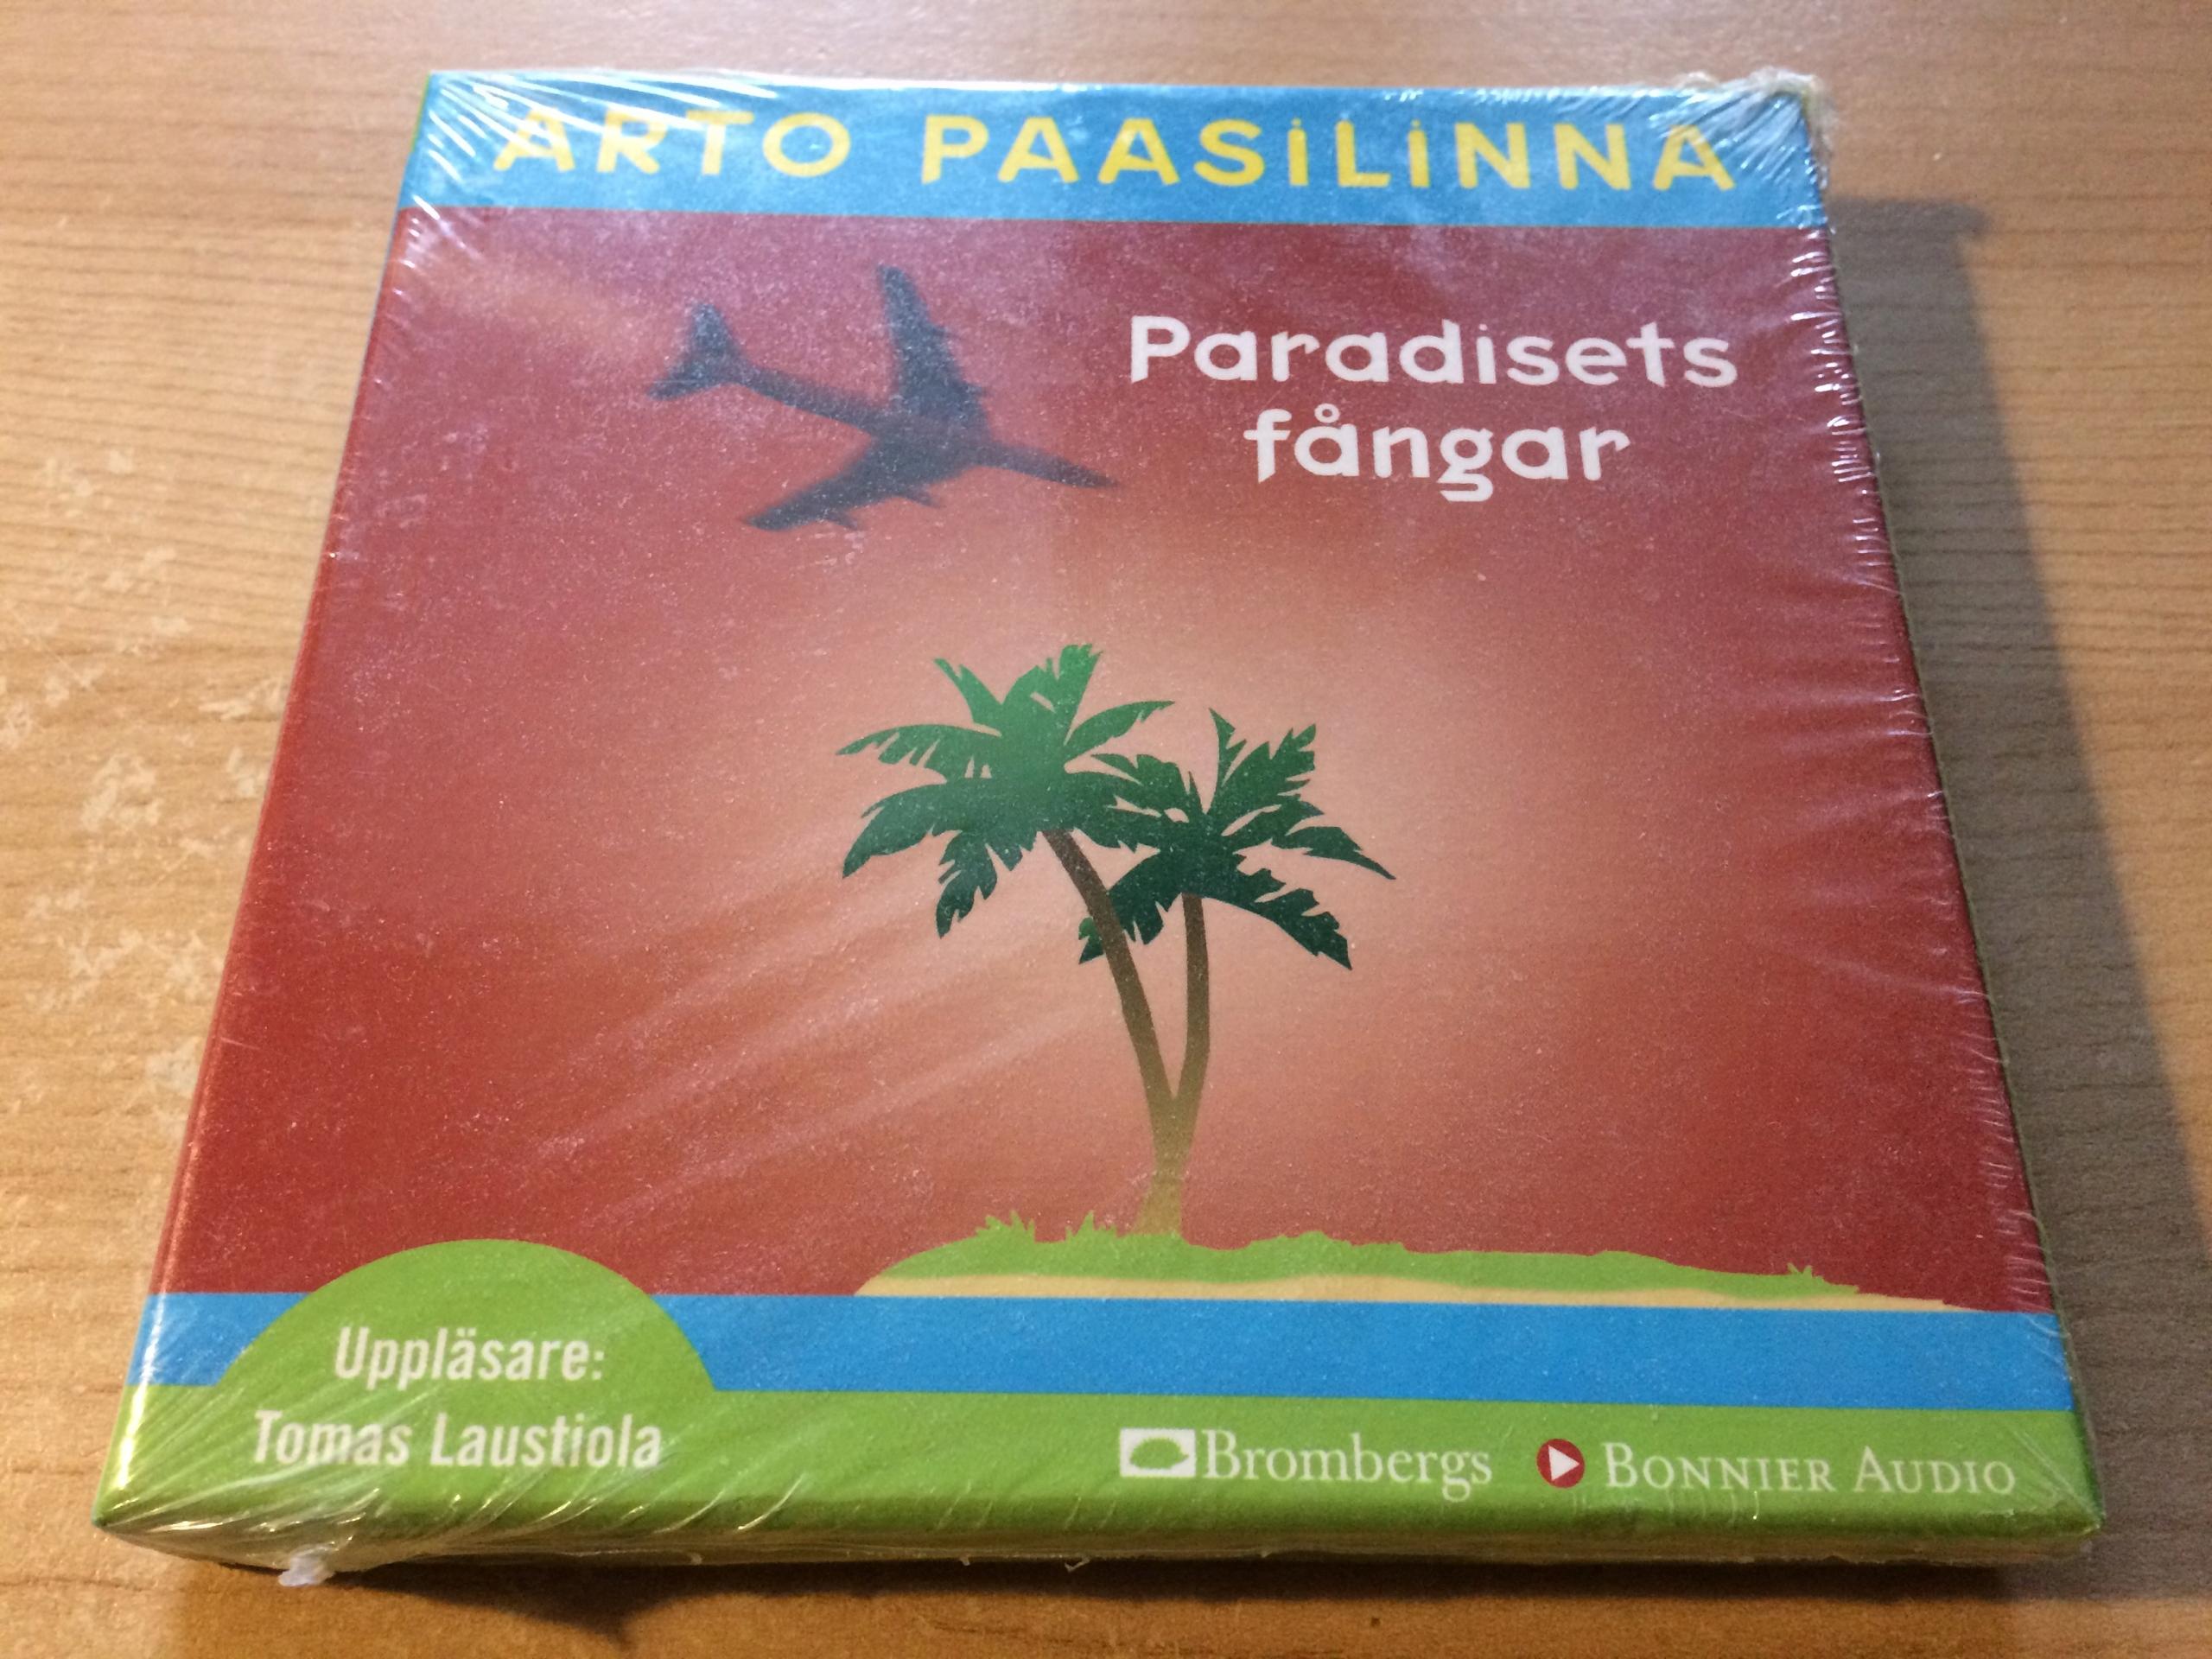 ARTO PAASILINNA PARADISETS FANGAR 6CD